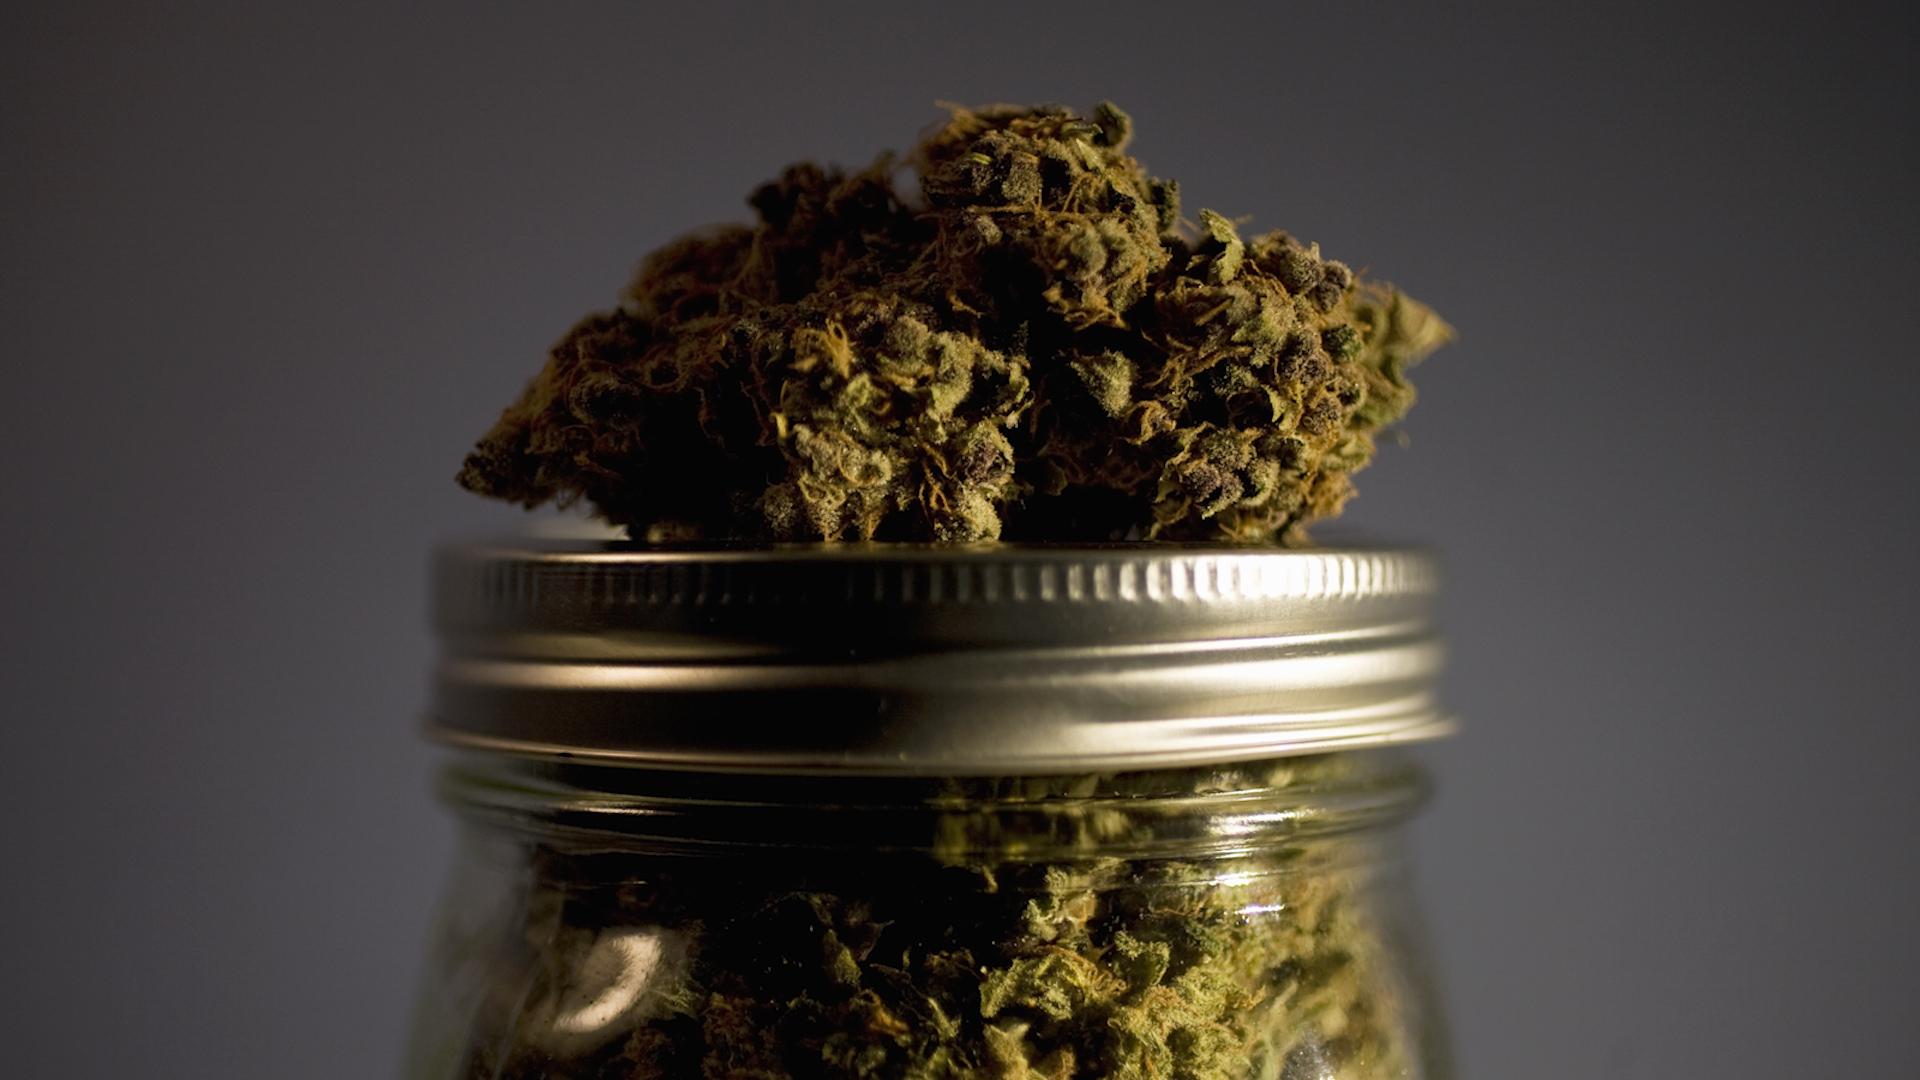 Canada introduces bill to legalize marijuana